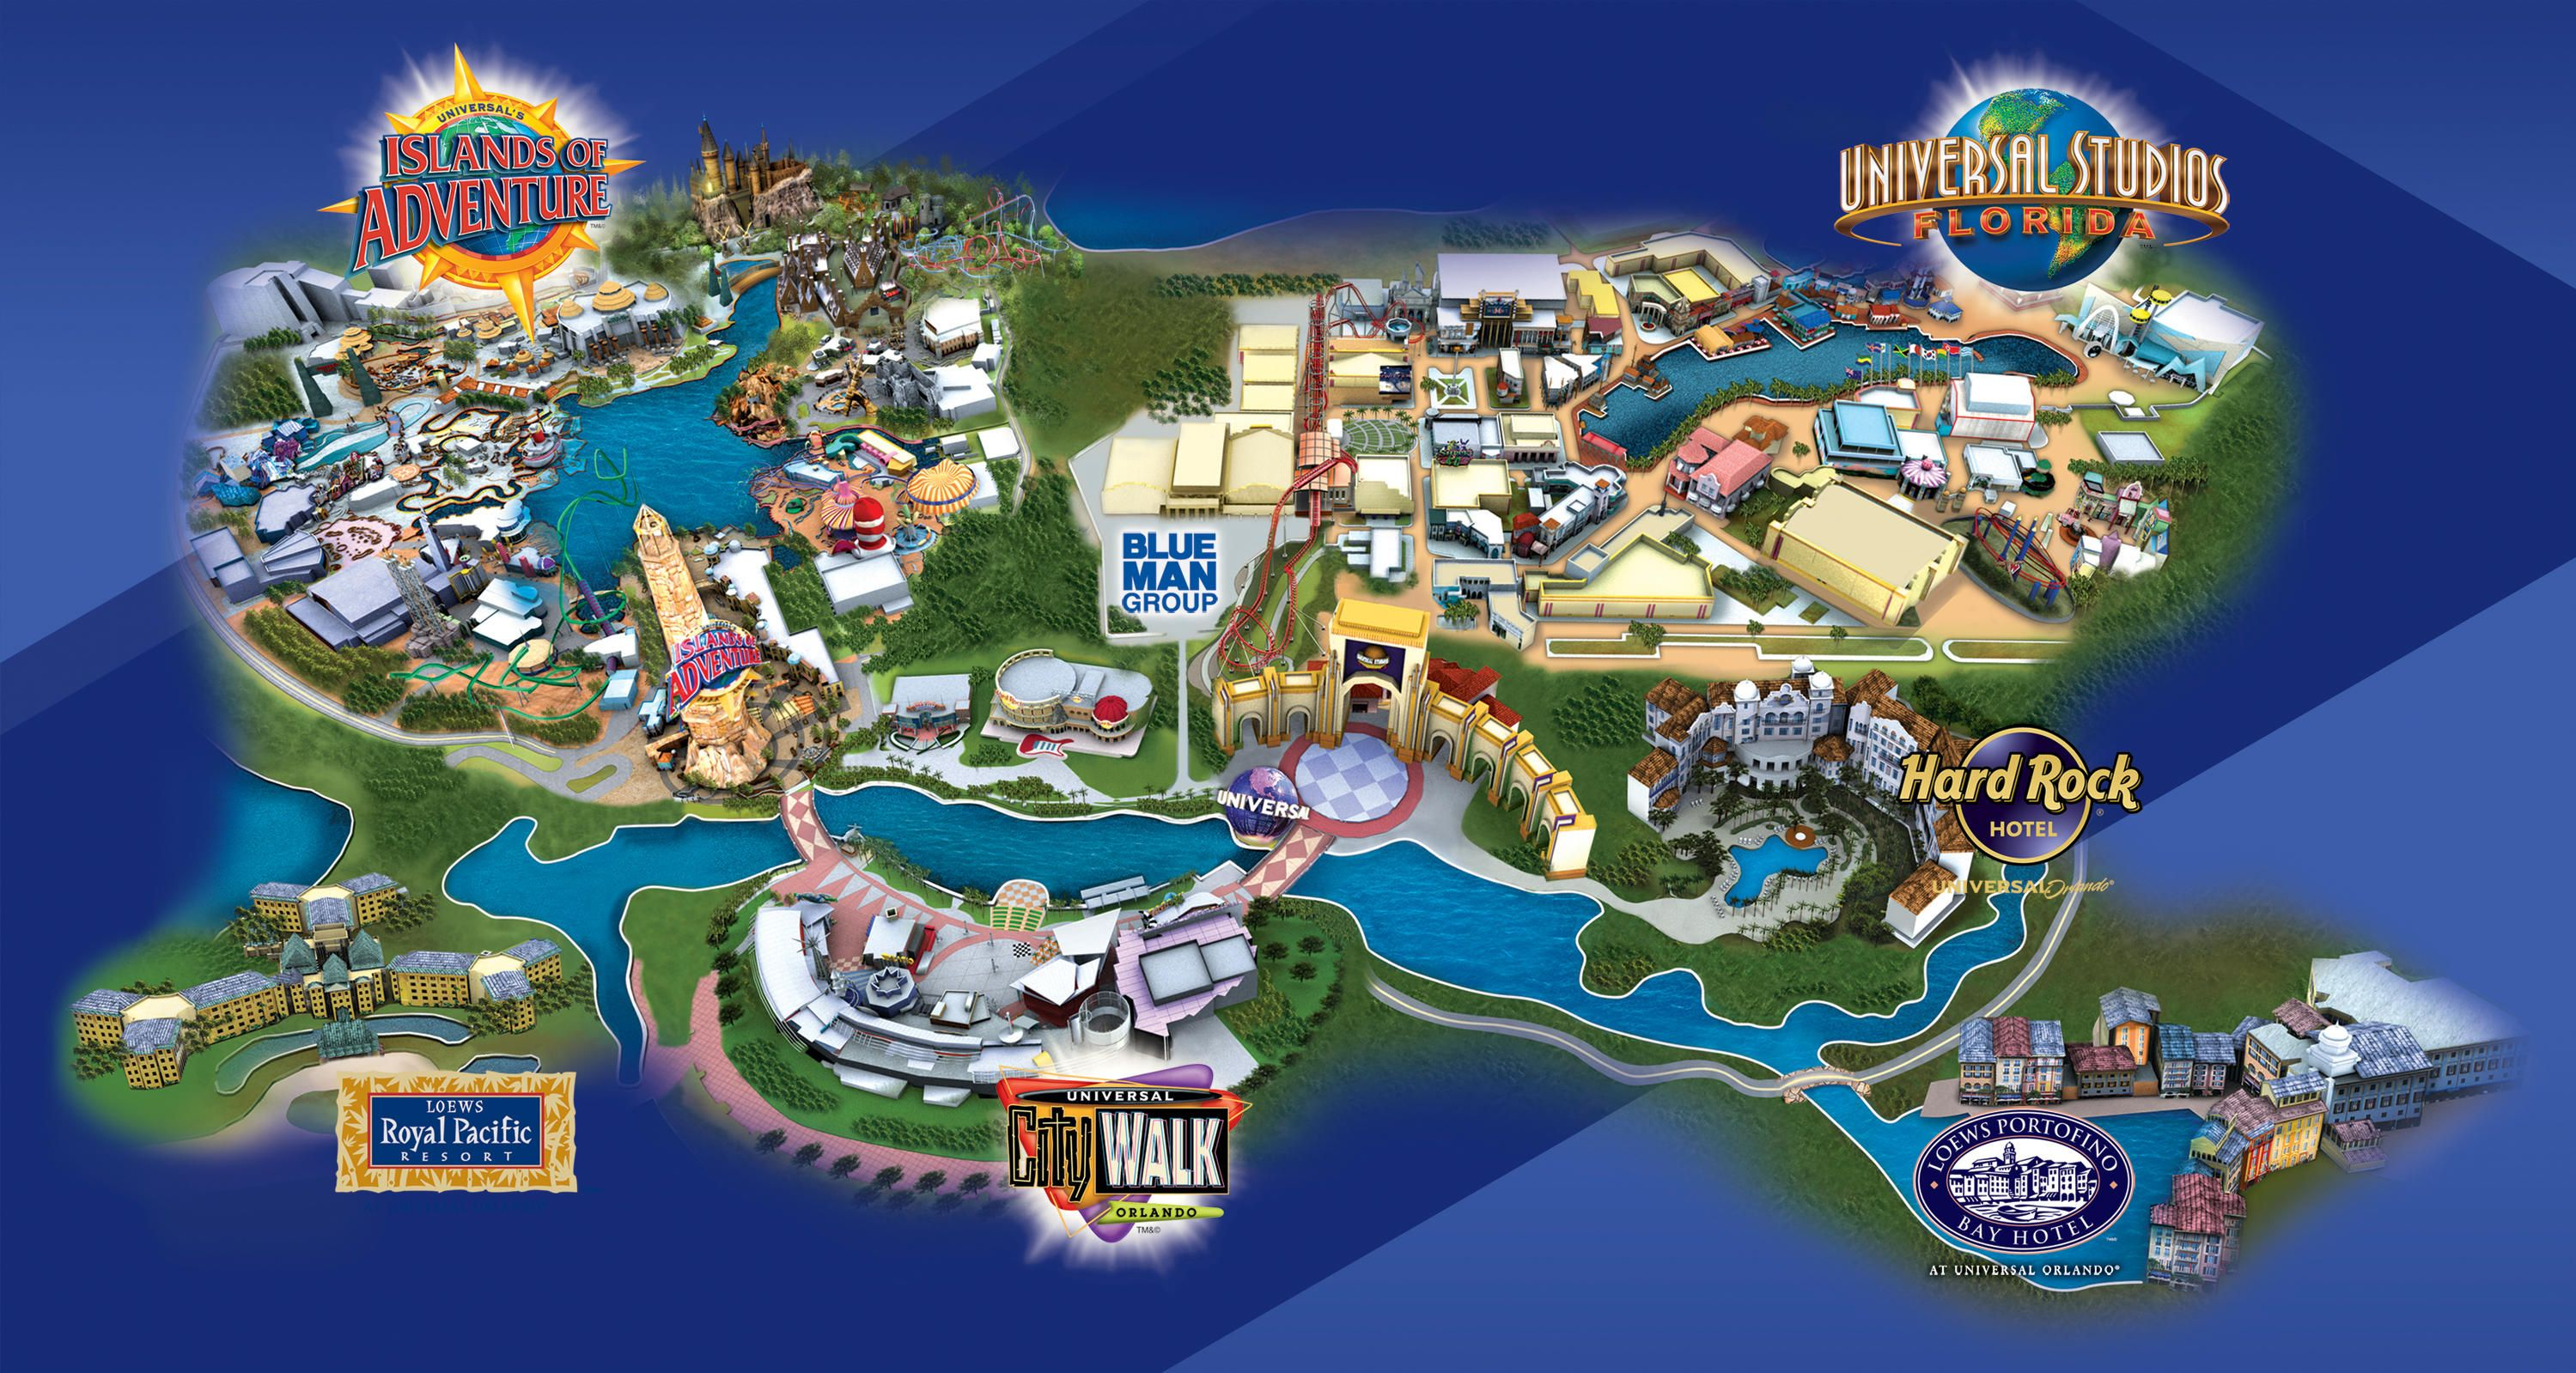 Universal studios orlando map 2015 universal orlando for A new image salon orlando